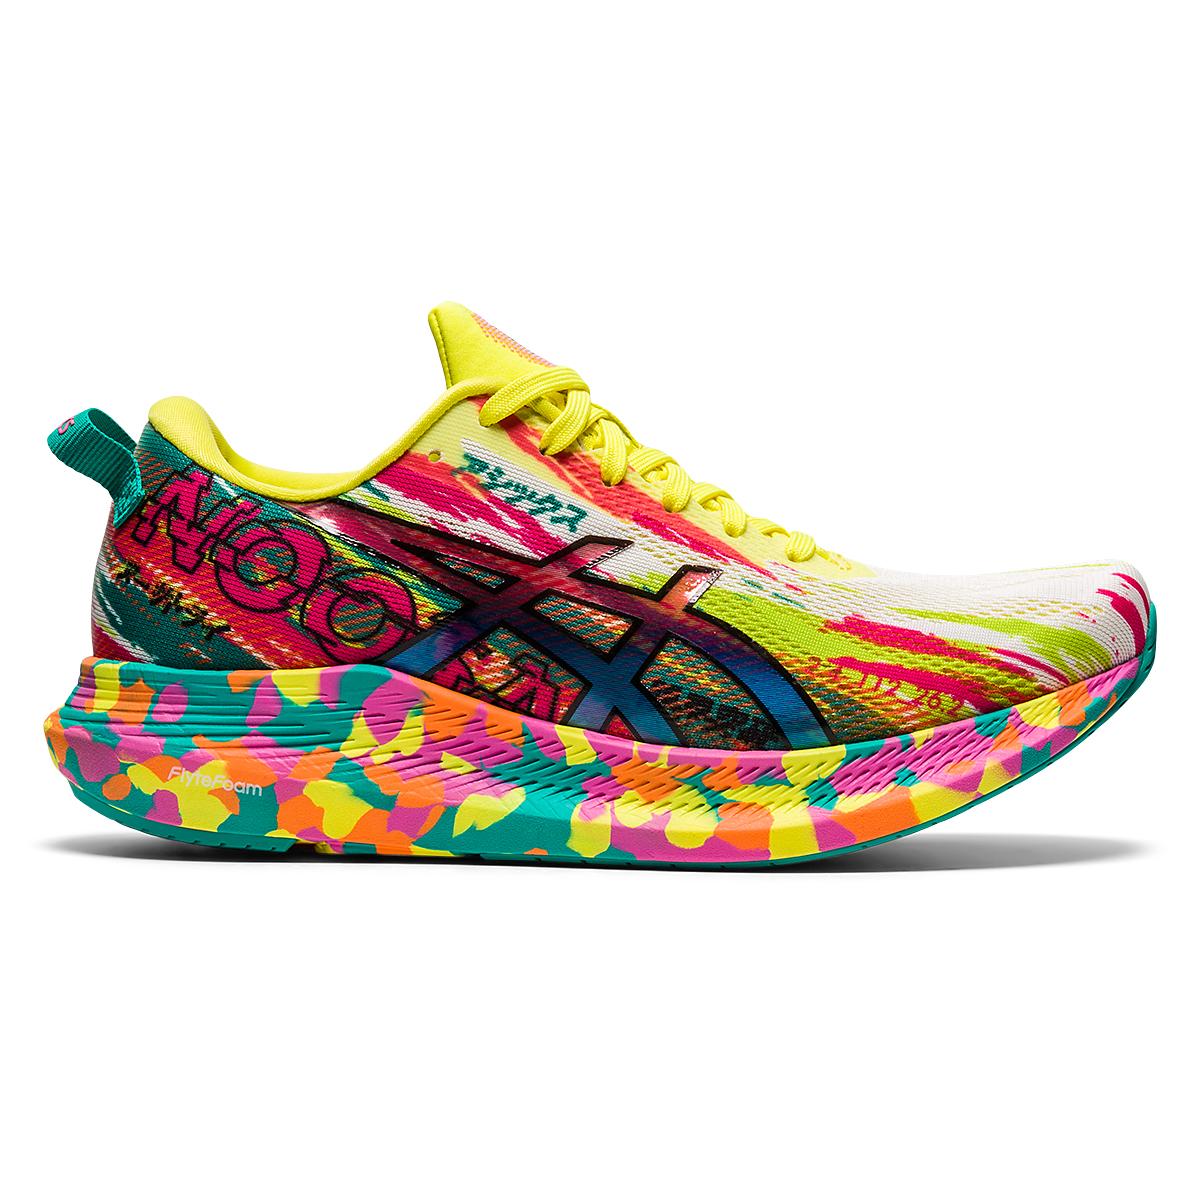 Women's Asics Noosa Tri 13 Running Shoe - Color: Hot Pink/Sour Yuzu - Size: 5 - Width: Regular, Hot Pink/Sour Yuzu, large, image 1